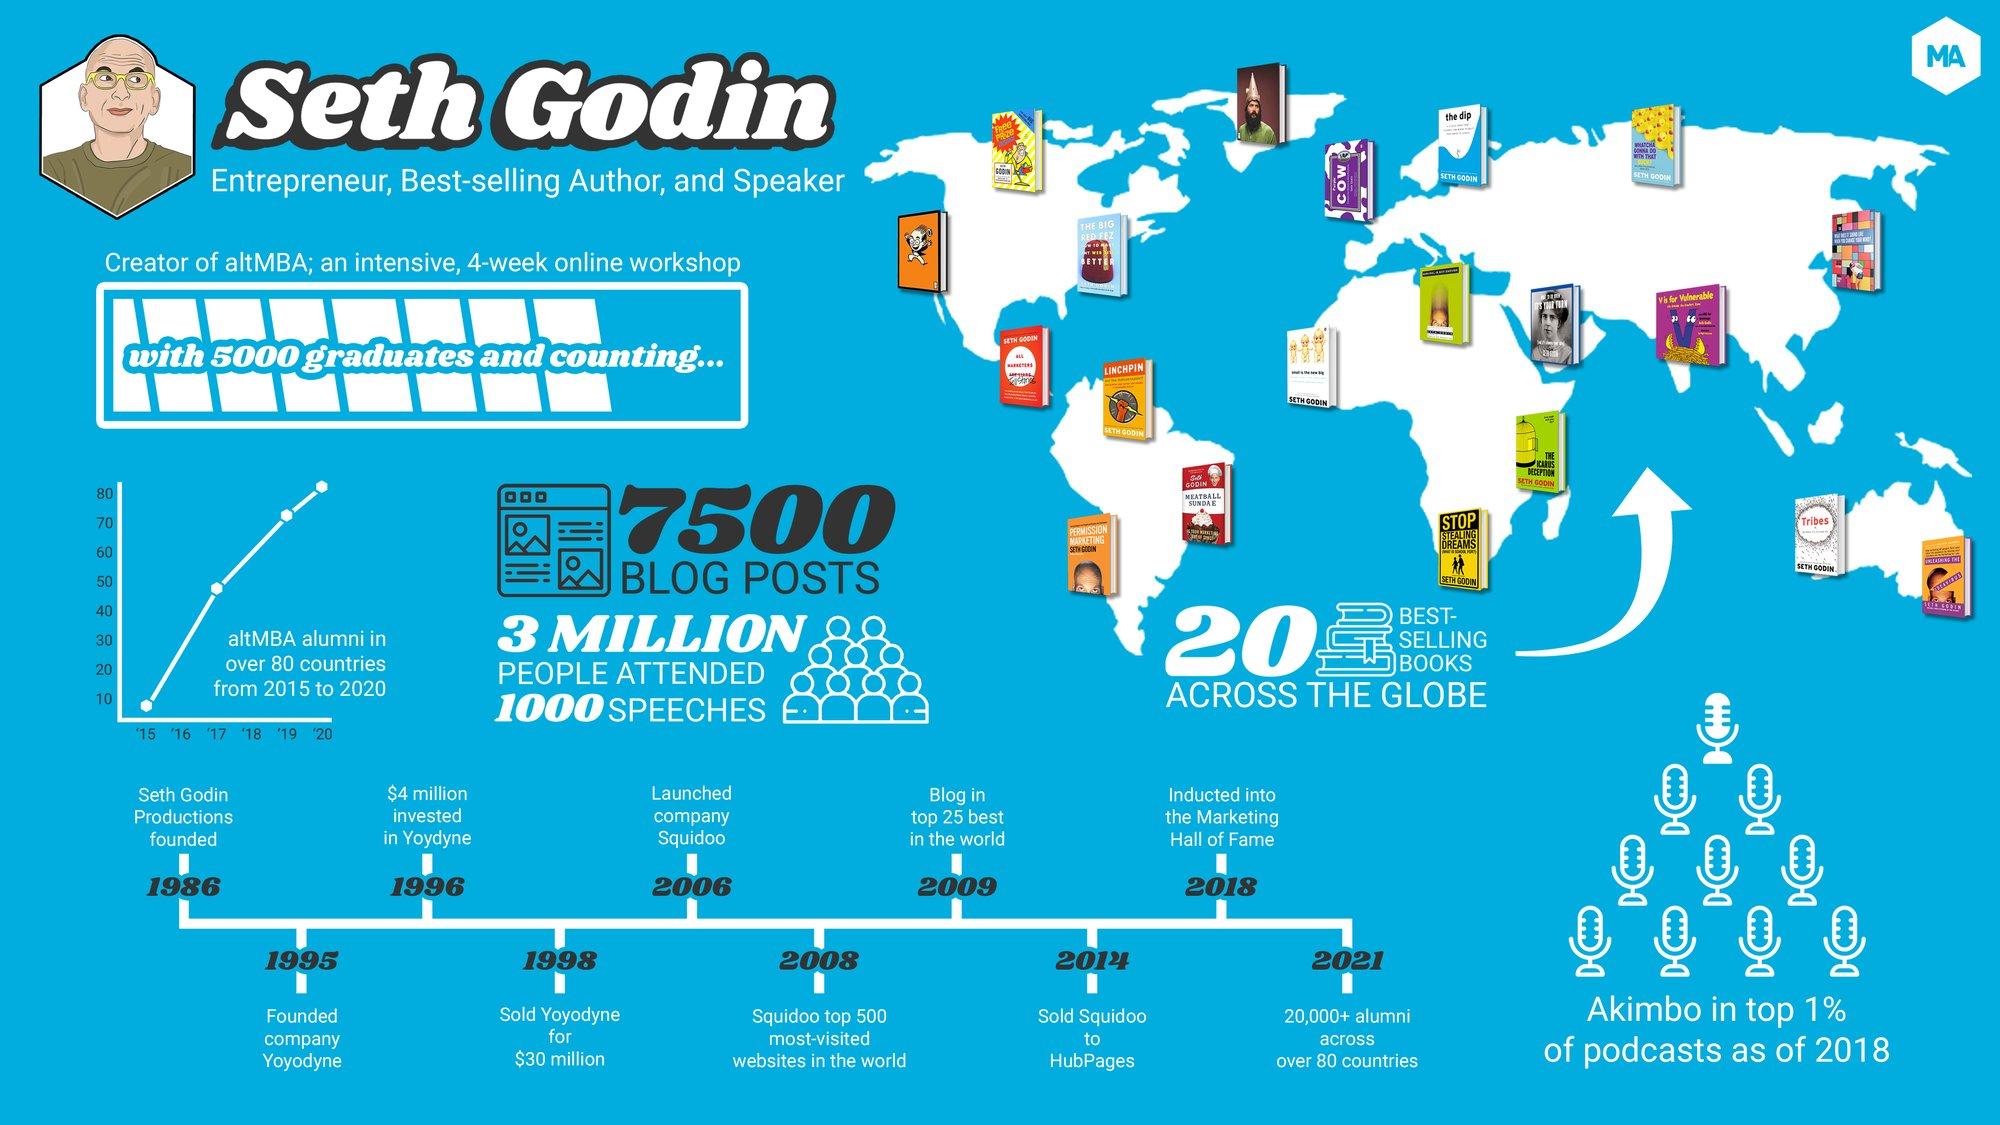 Seth Godin - infographic